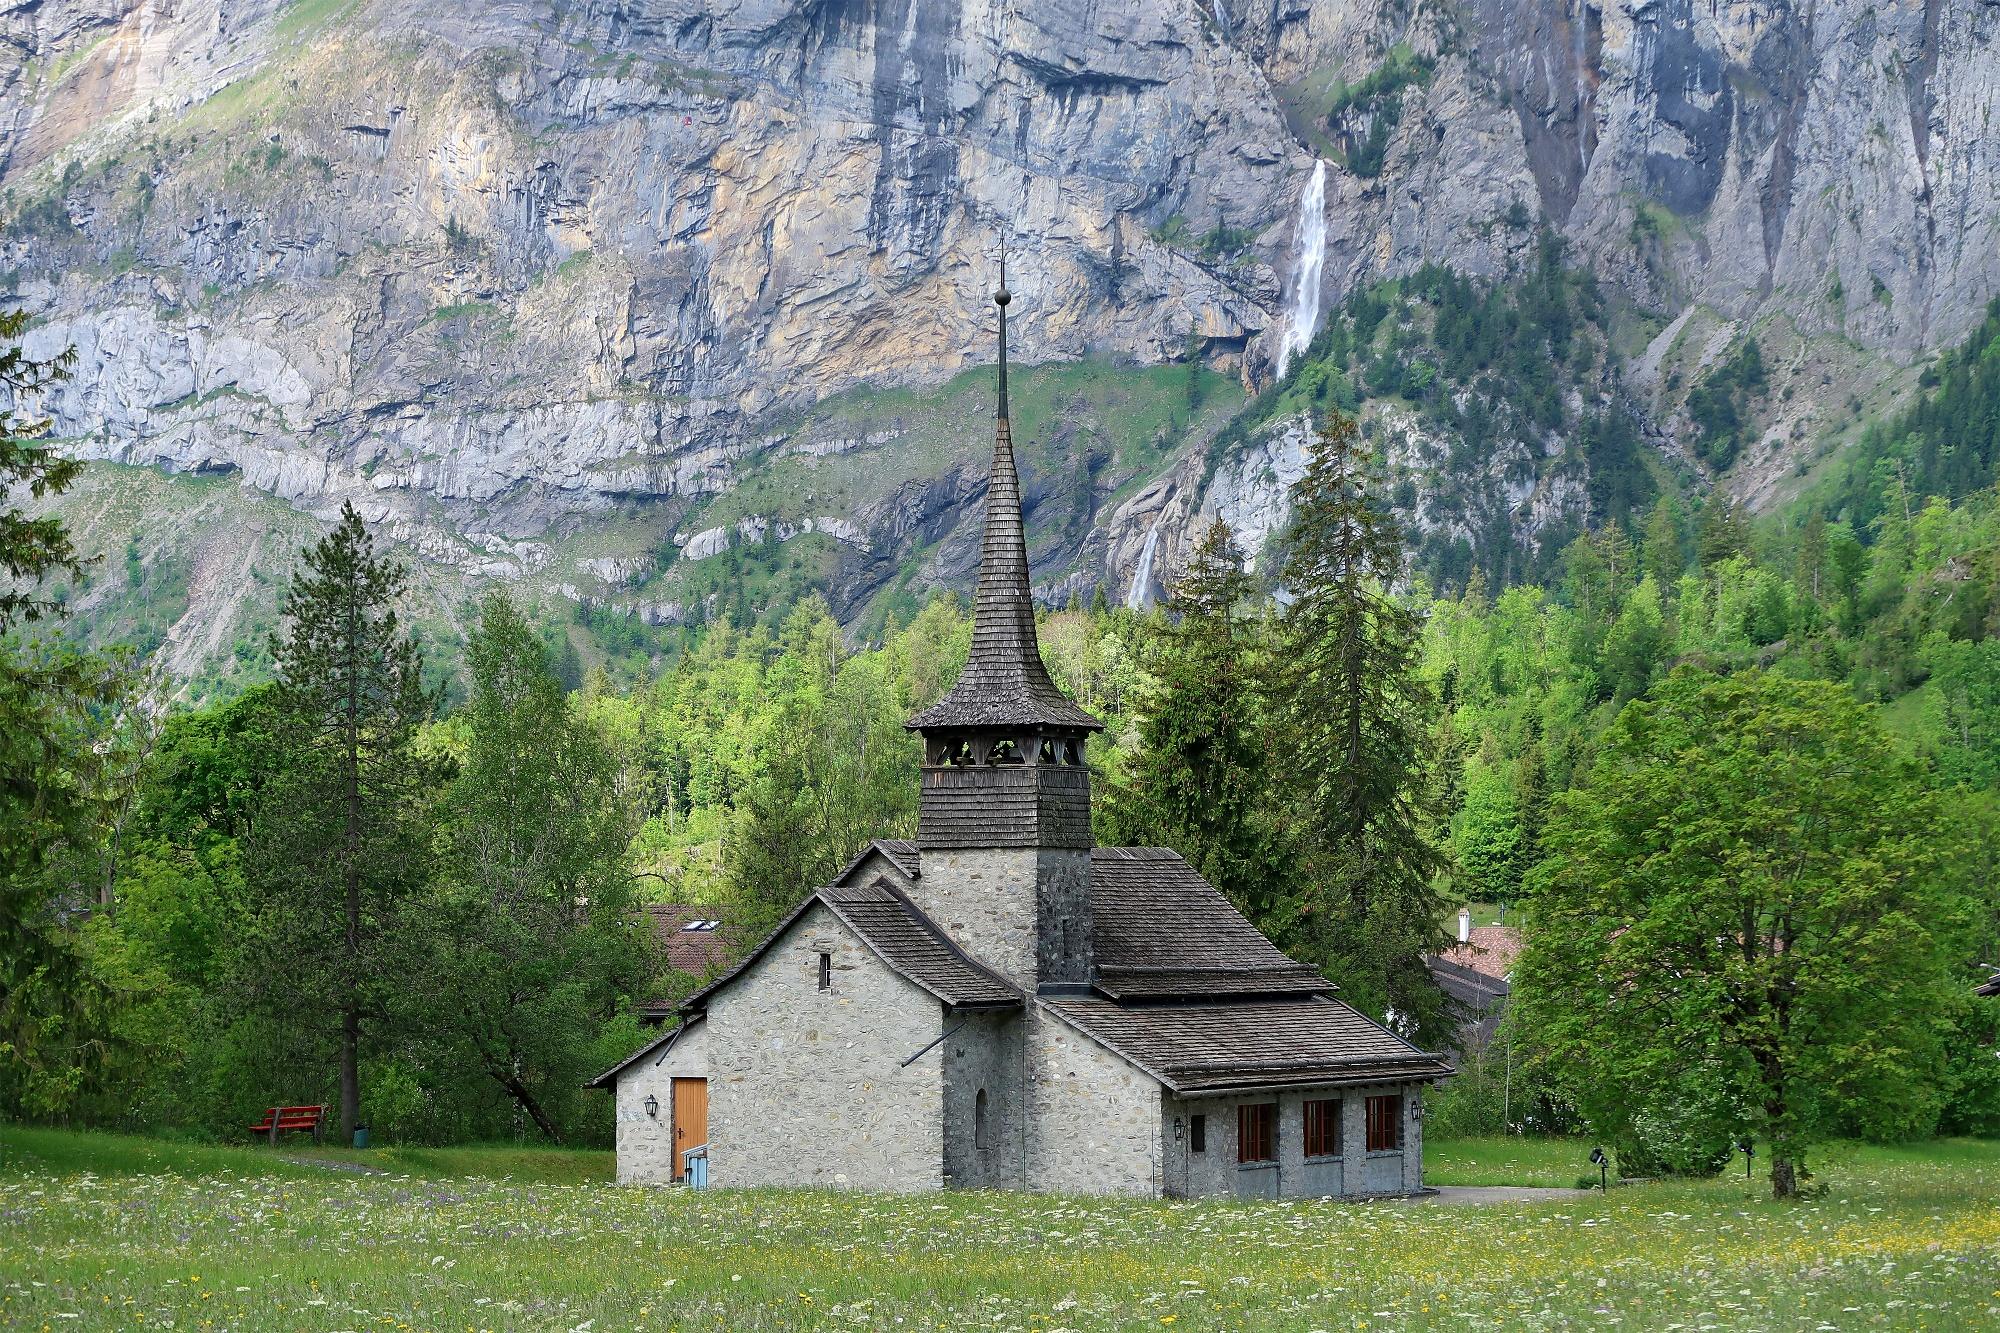 Katholische Kirche Kandersteg.